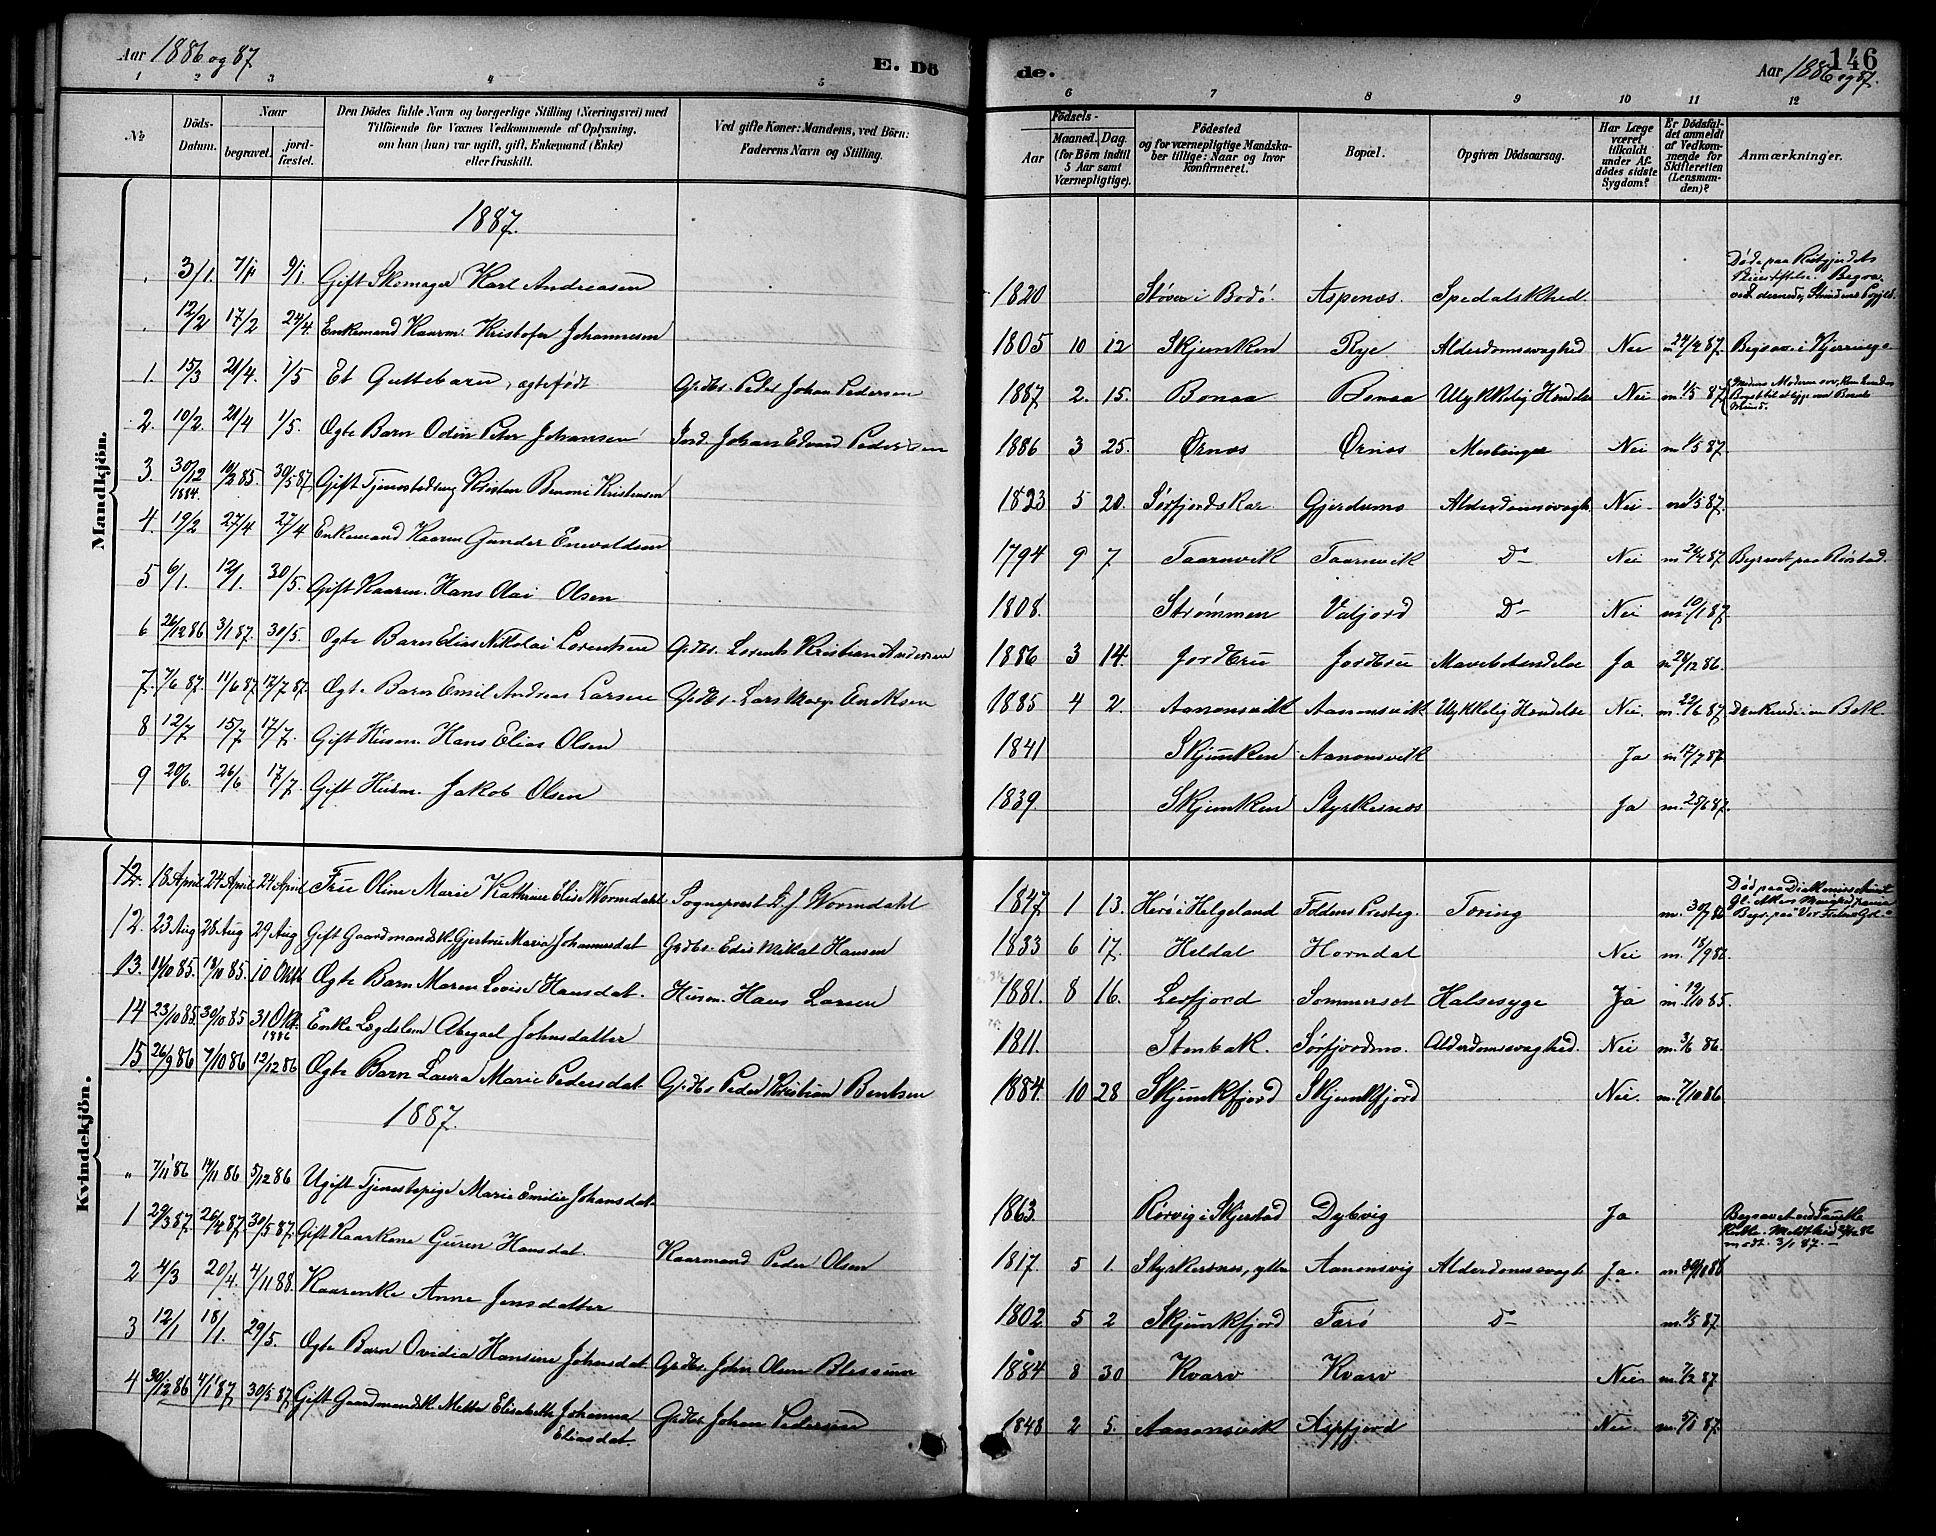 SAT, Ministerialprotokoller, klokkerbøker og fødselsregistre - Nordland, 854/L0777: Ministerialbok nr. 854A01 /1, 1883-1891, s. 146